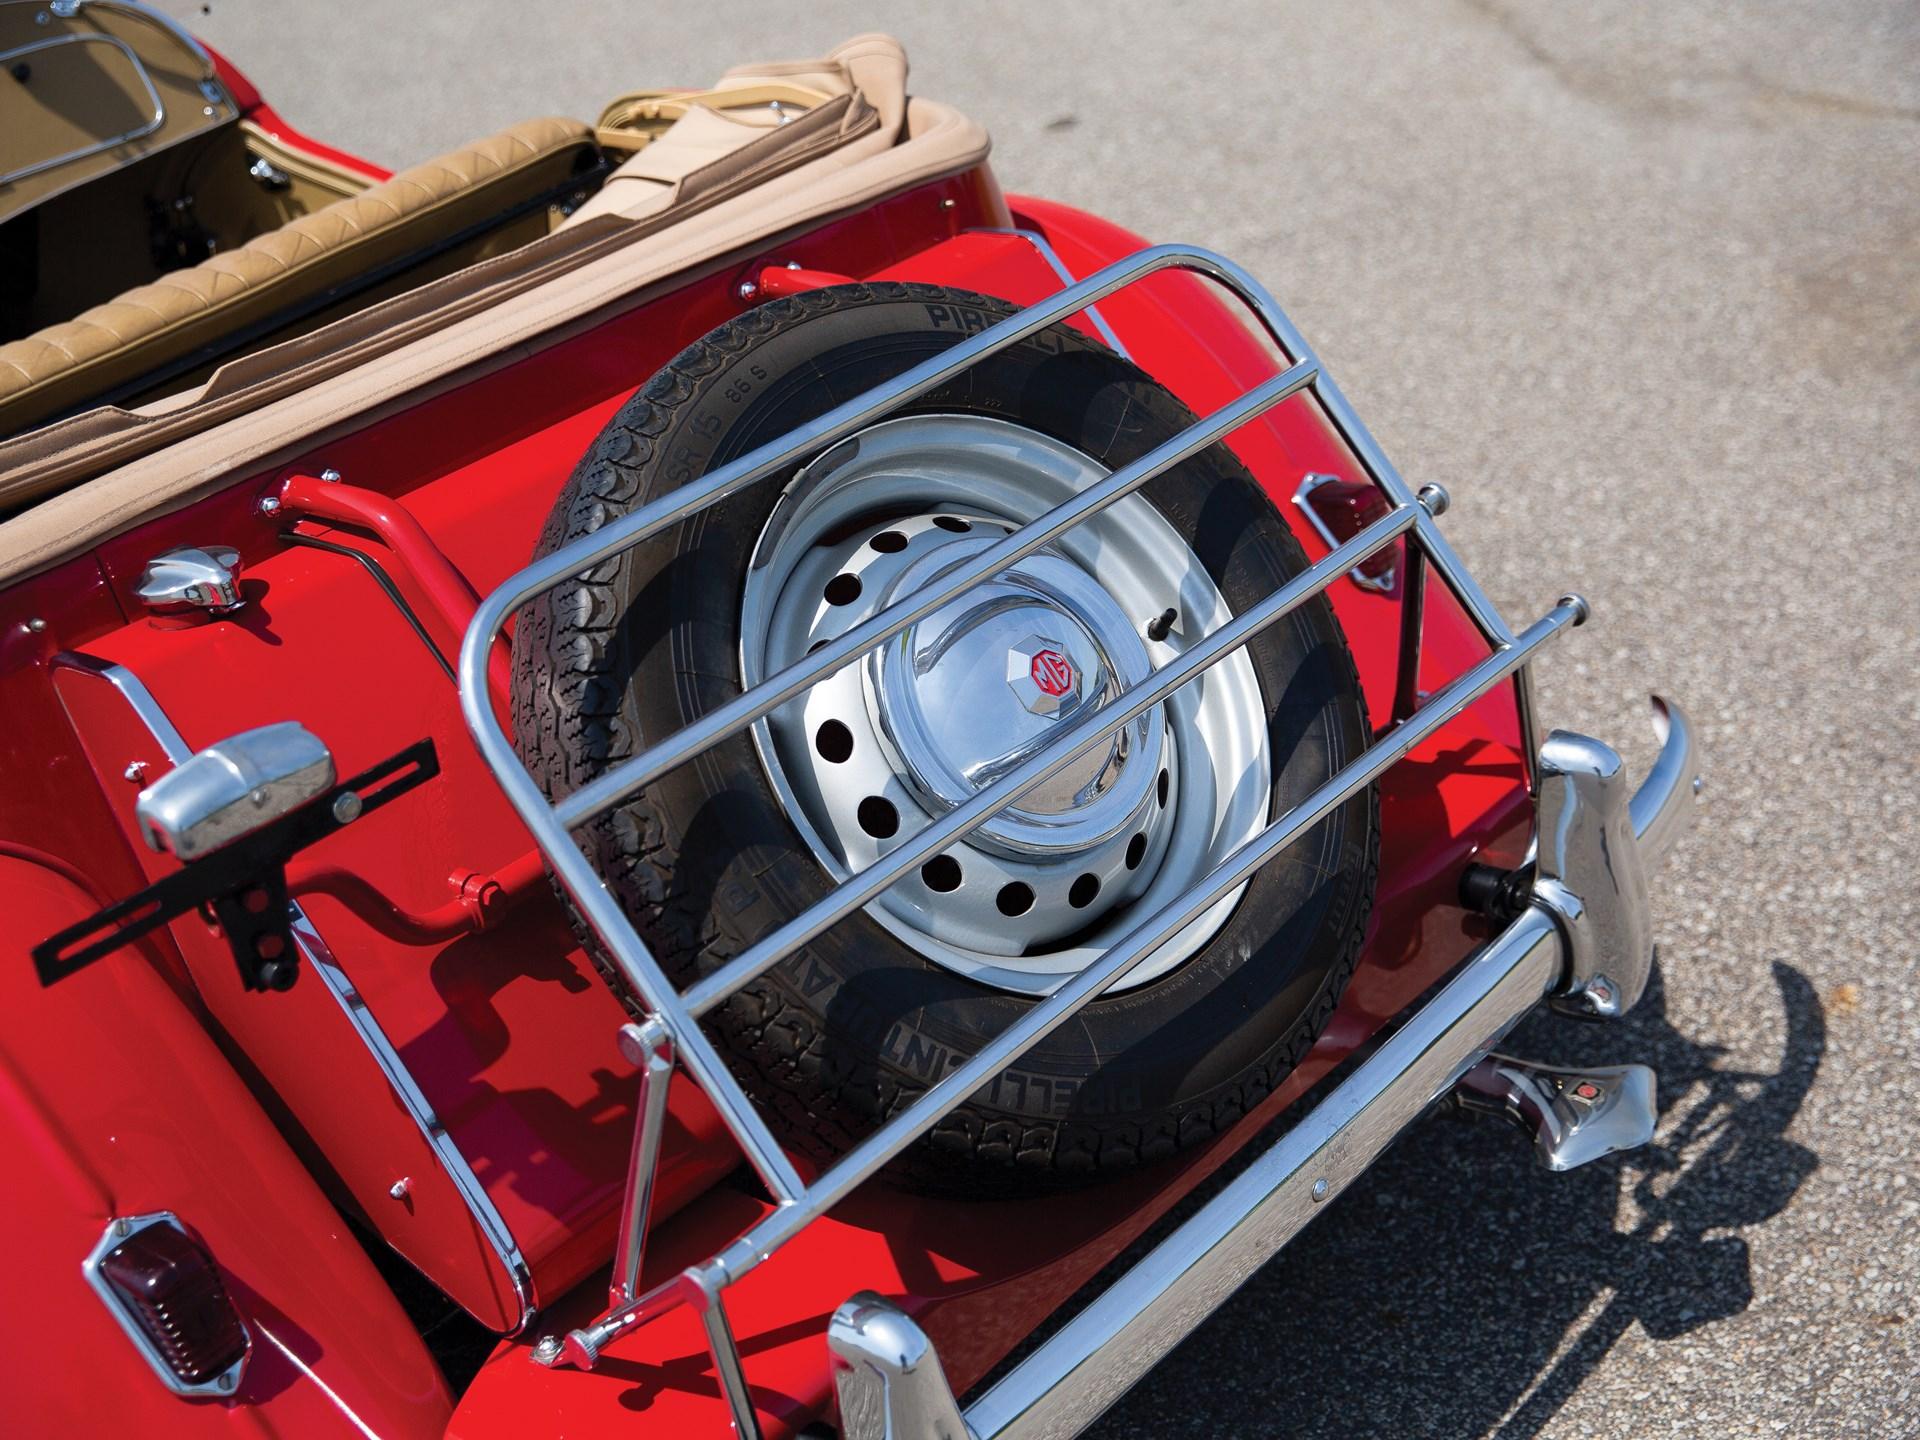 1952 MG TD rear tire spare